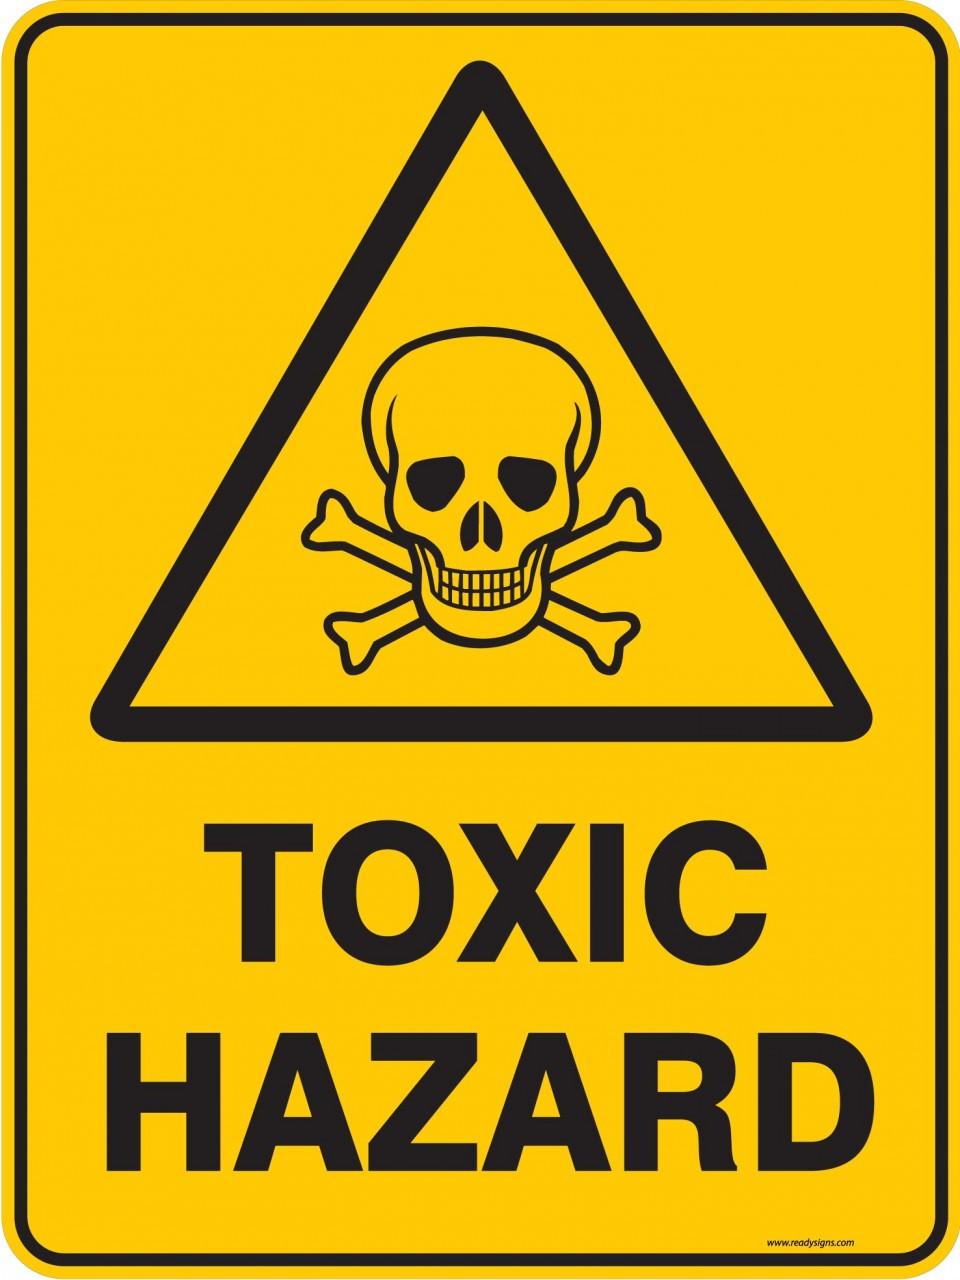 Warning Sign - TOXIC HAZARD - Ready Signs